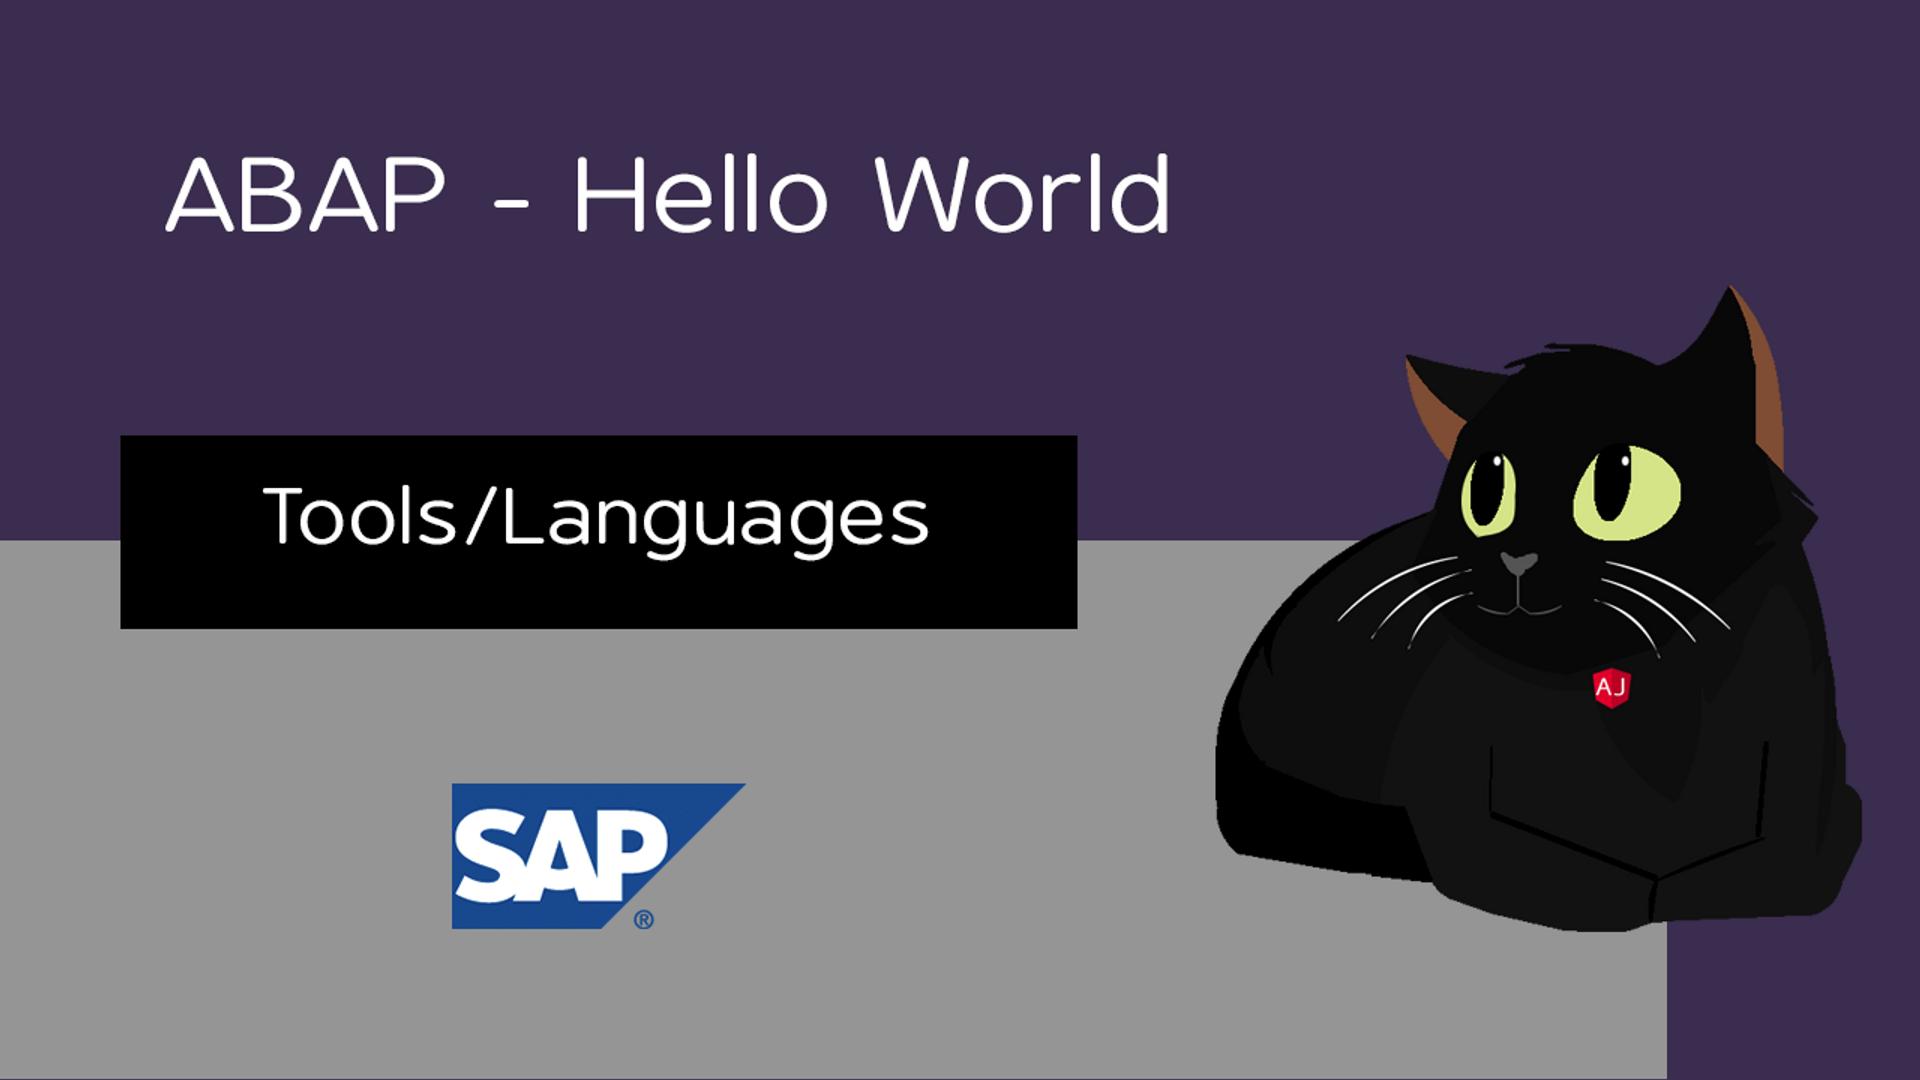 ABAP - Hello World